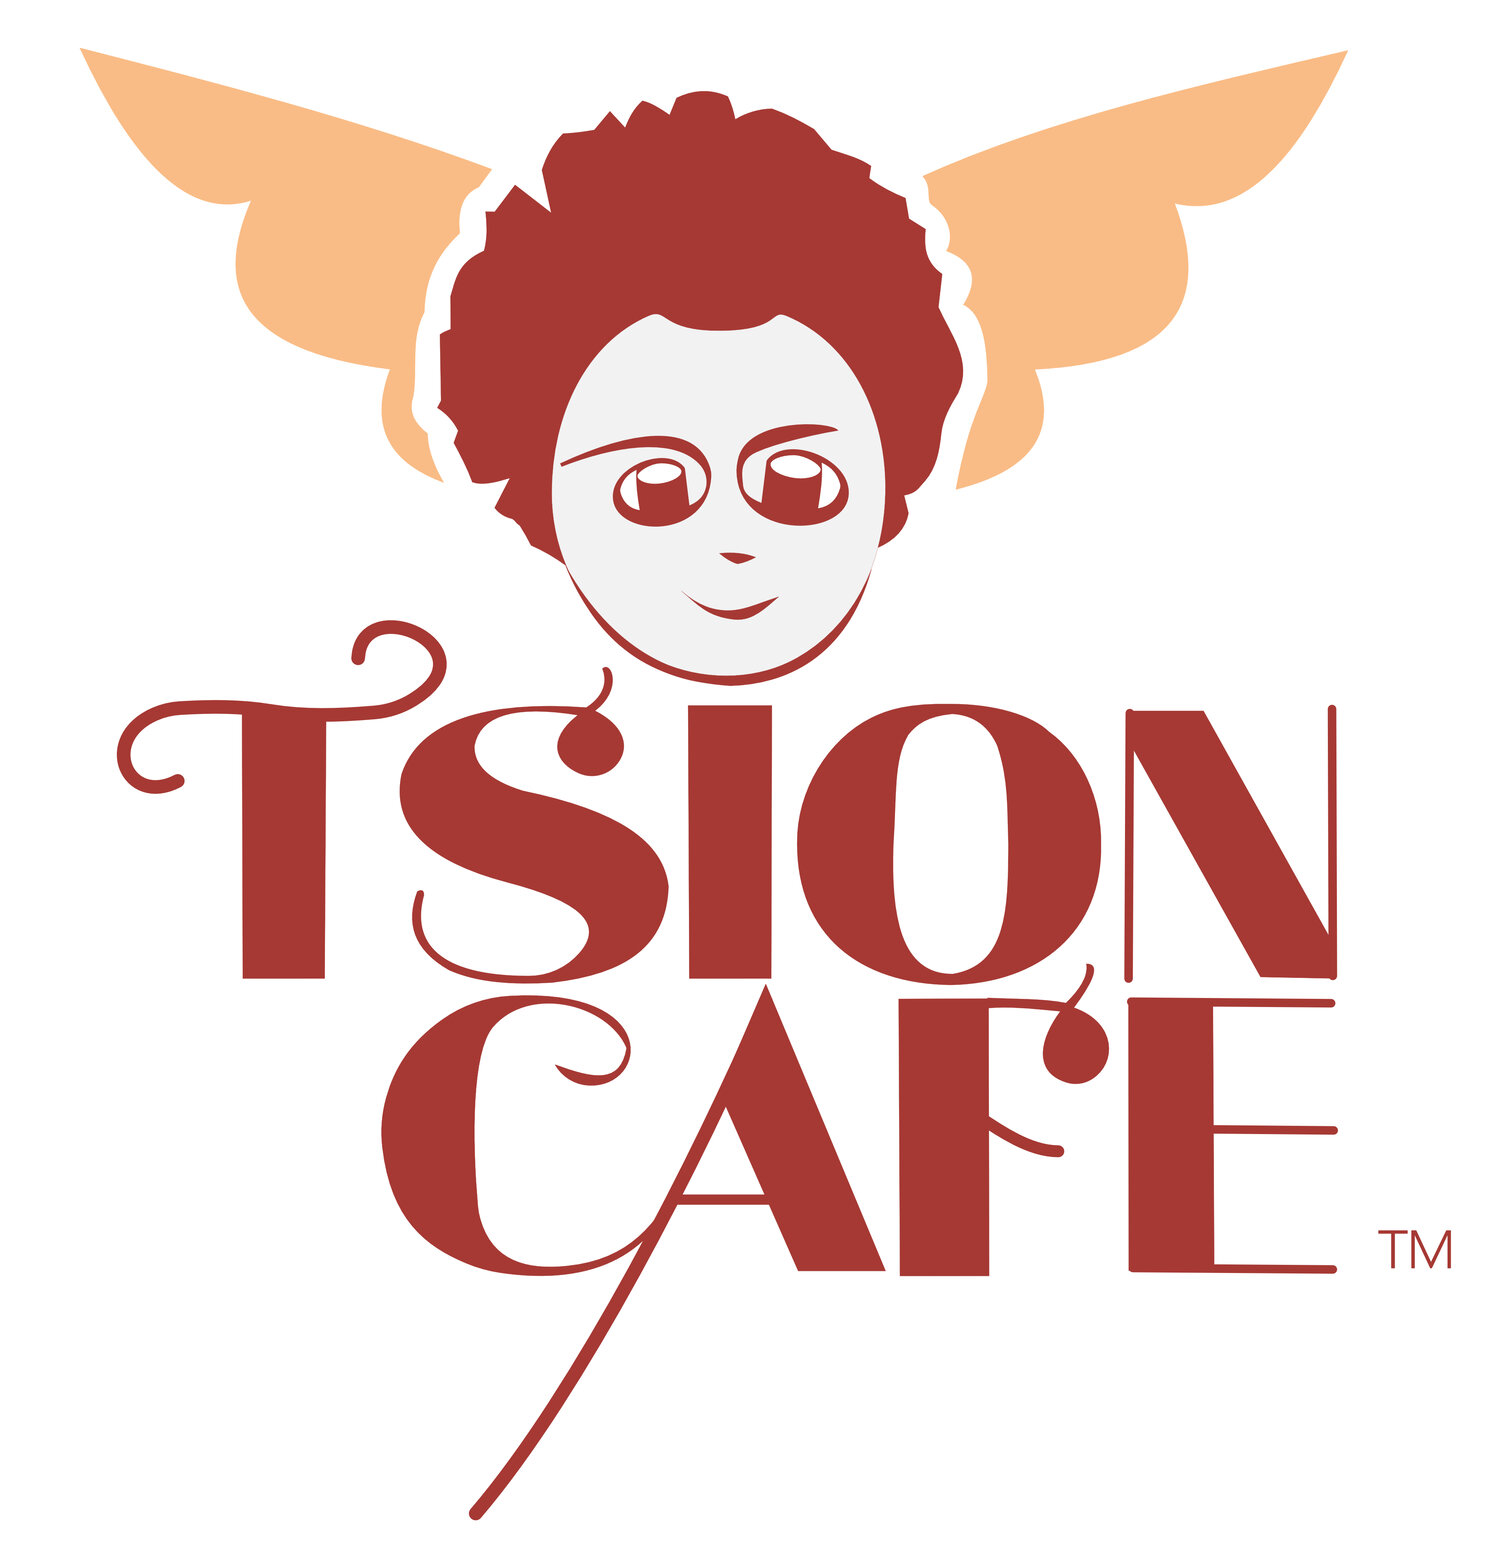 Tsion Cafe & Restaurant